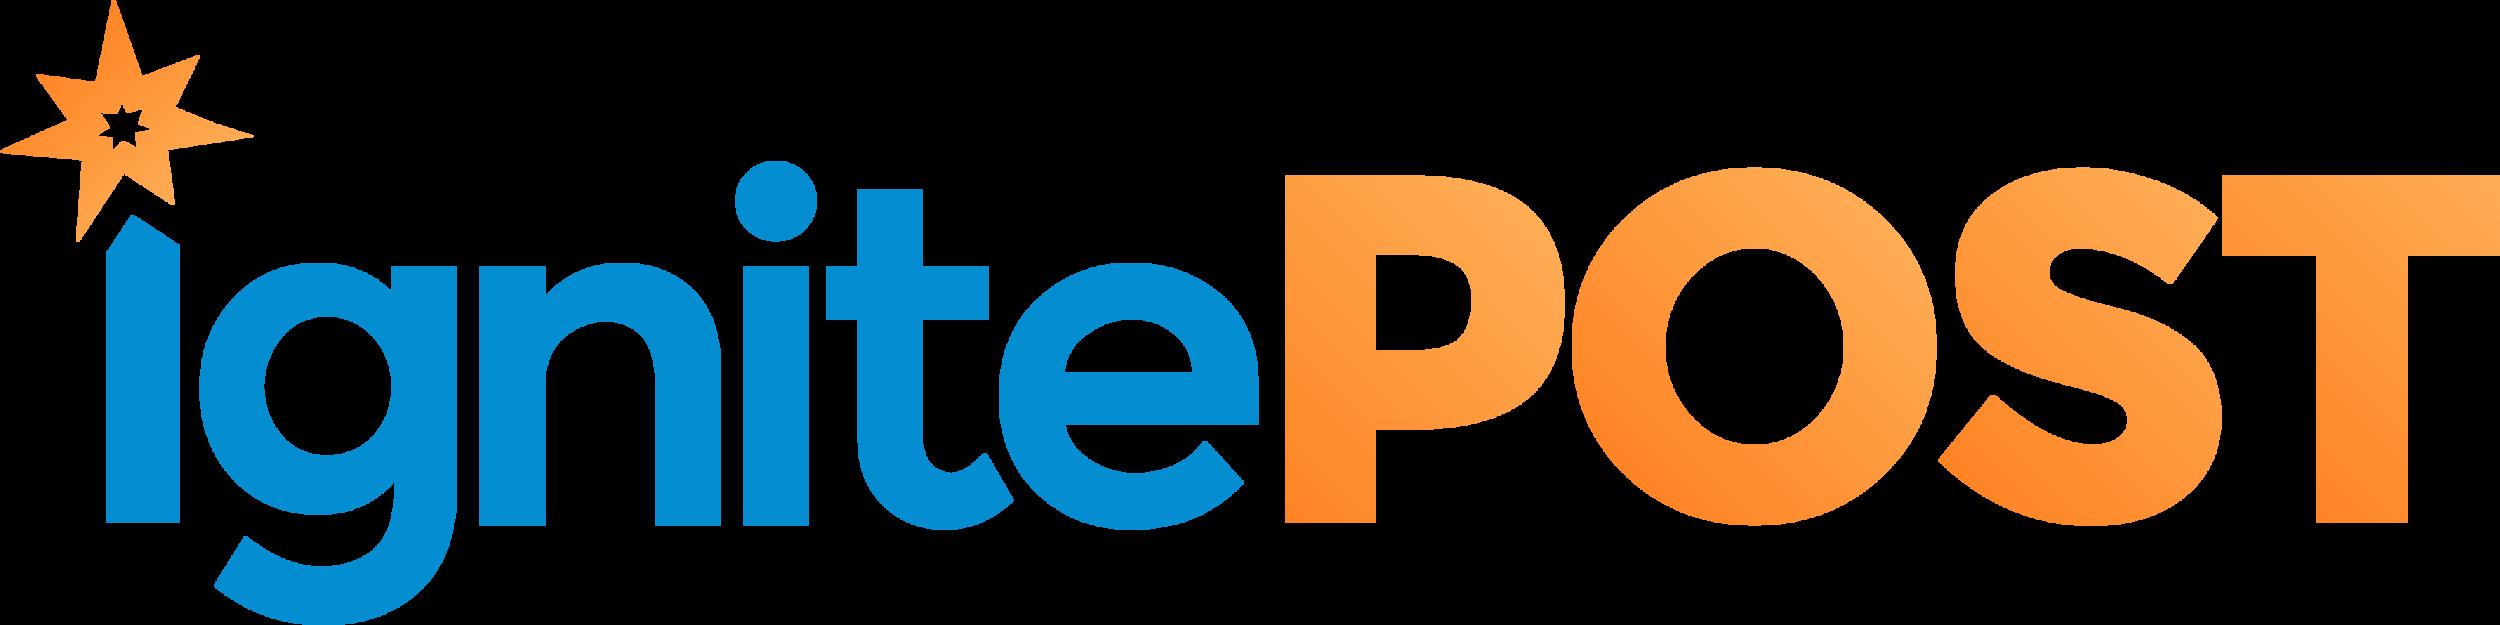 ignitepost_logo(web).png